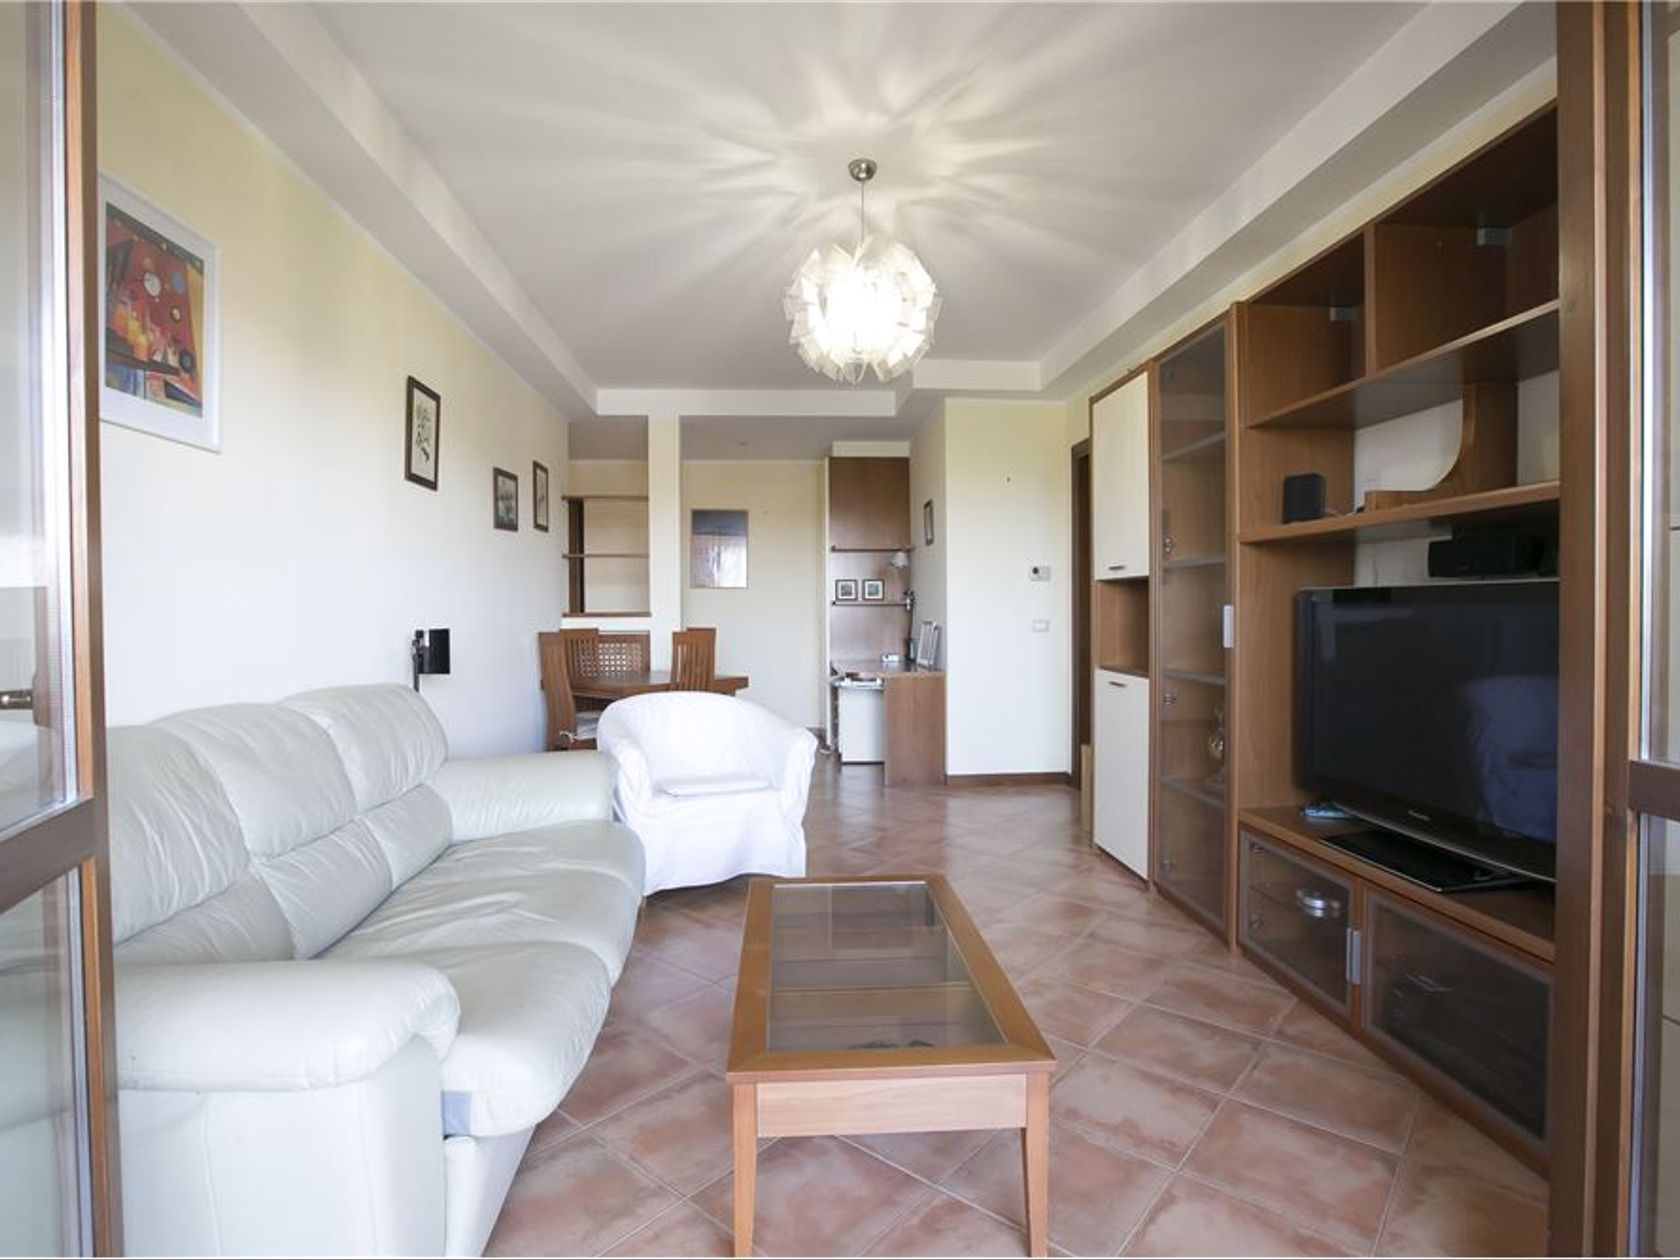 Appartamento Roma-acilia Vitinia Infernetto Axa Casal Palocco, Roma, RM Vendita - Foto 3